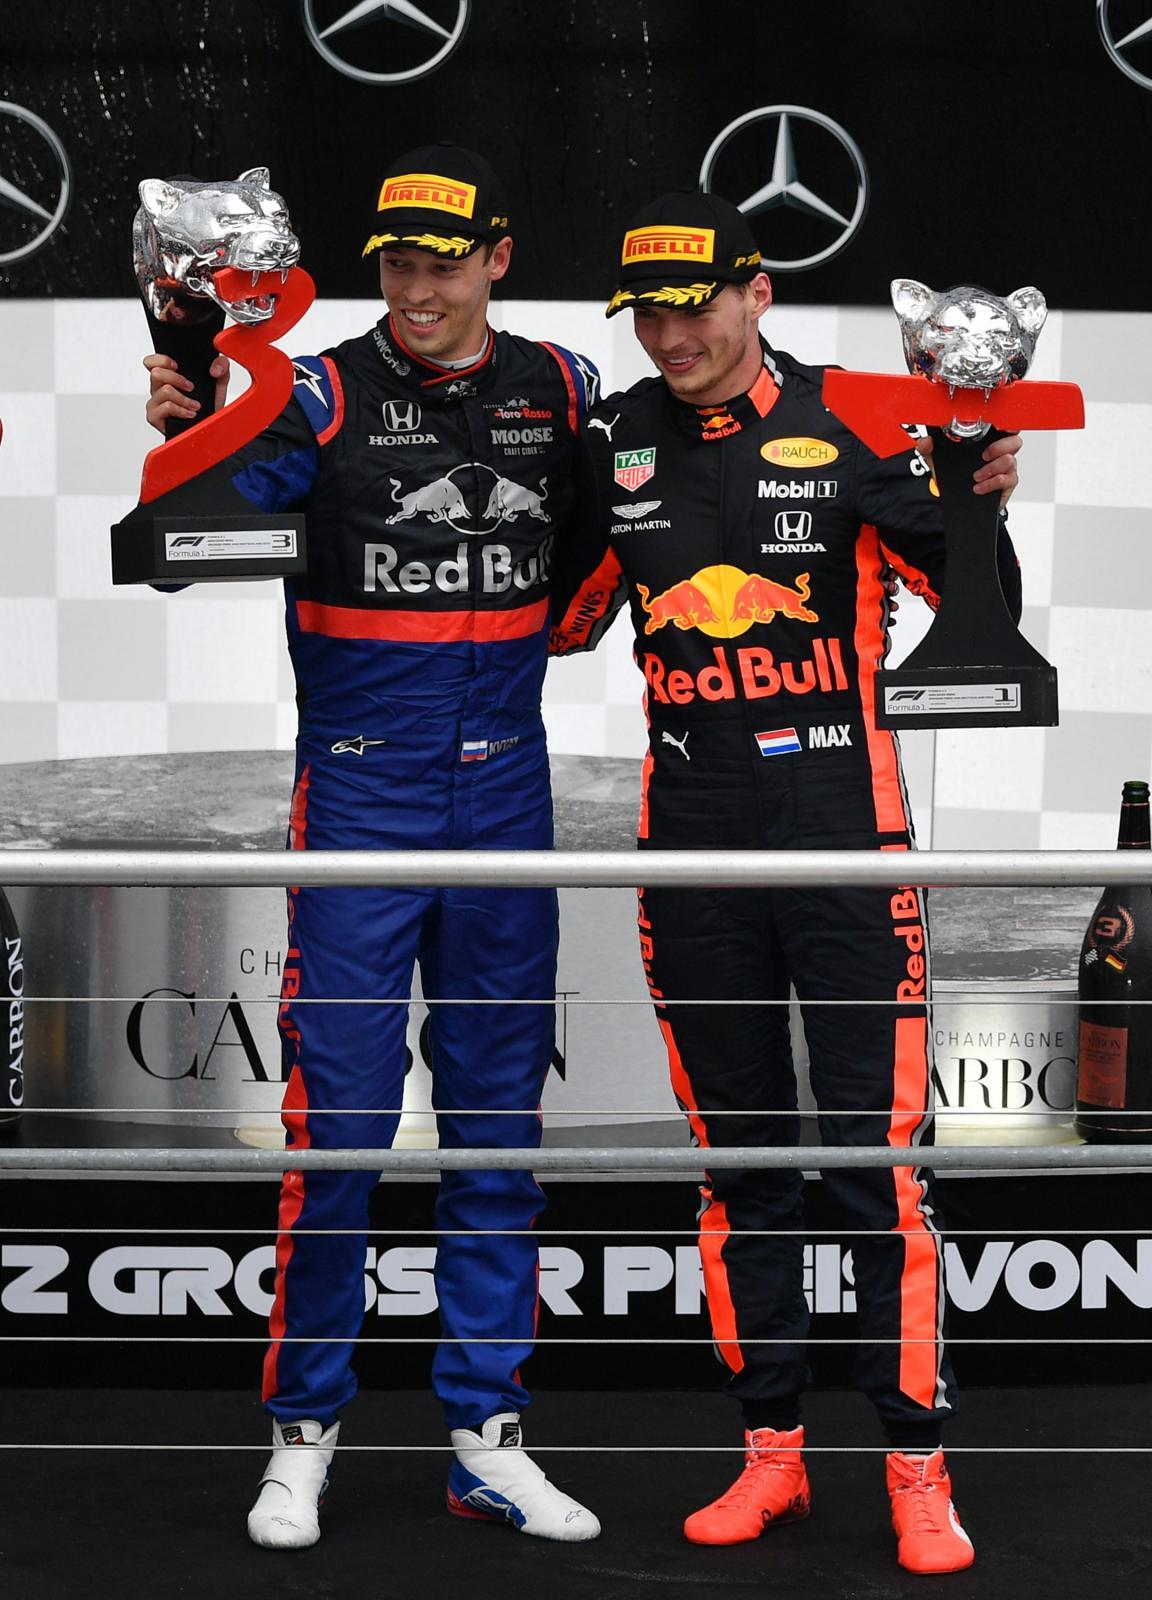 186367 Formula 1 2019 Round Eleven - Hockenheim Germany